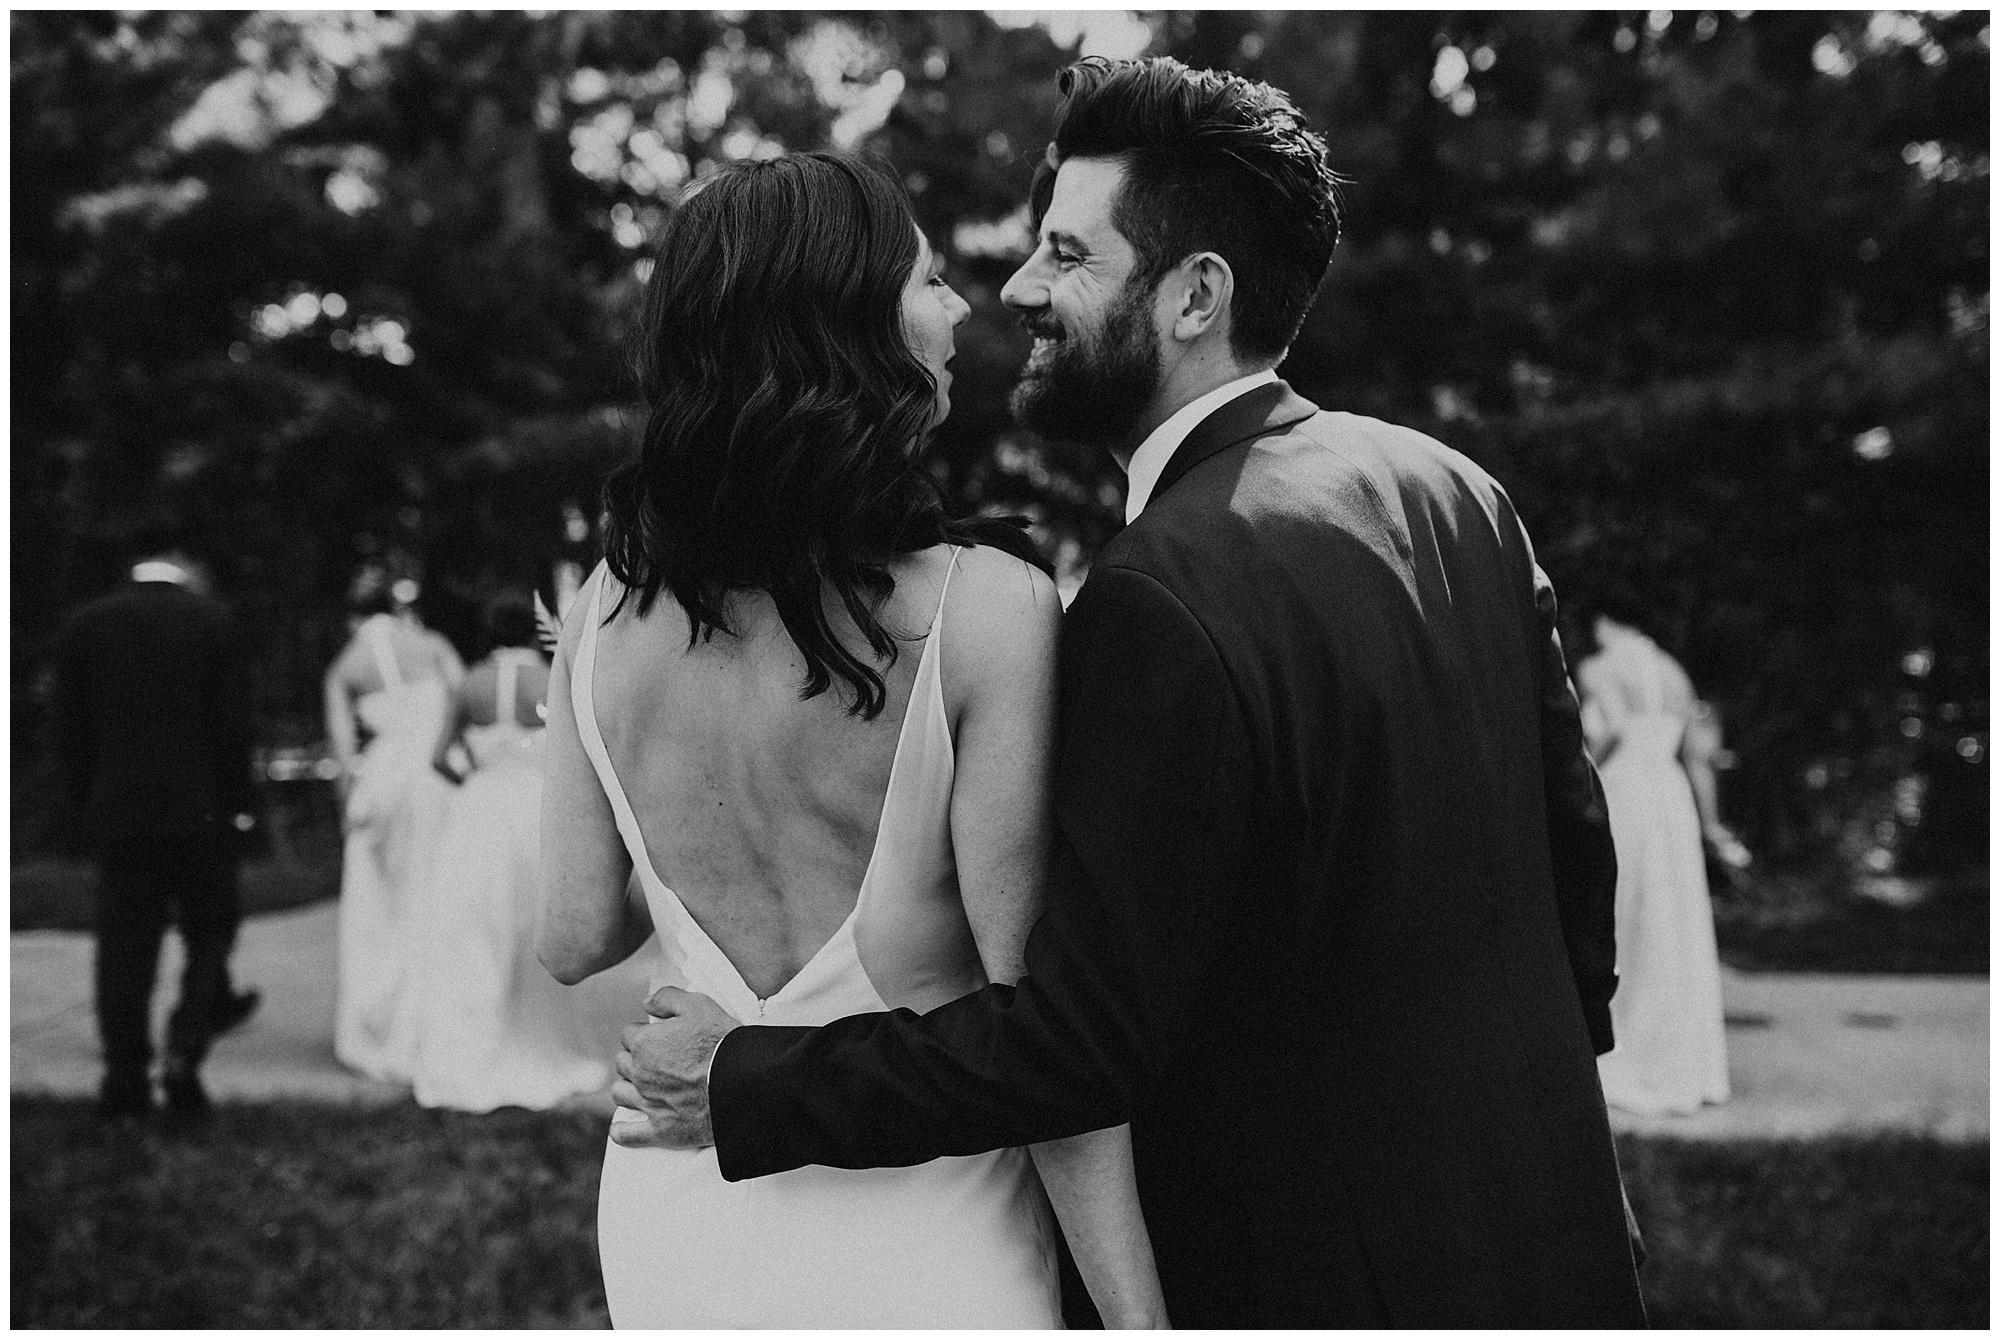 allerton_park_wedding_champaign_il_chicago_wright_photographs_ne_0081.jpg